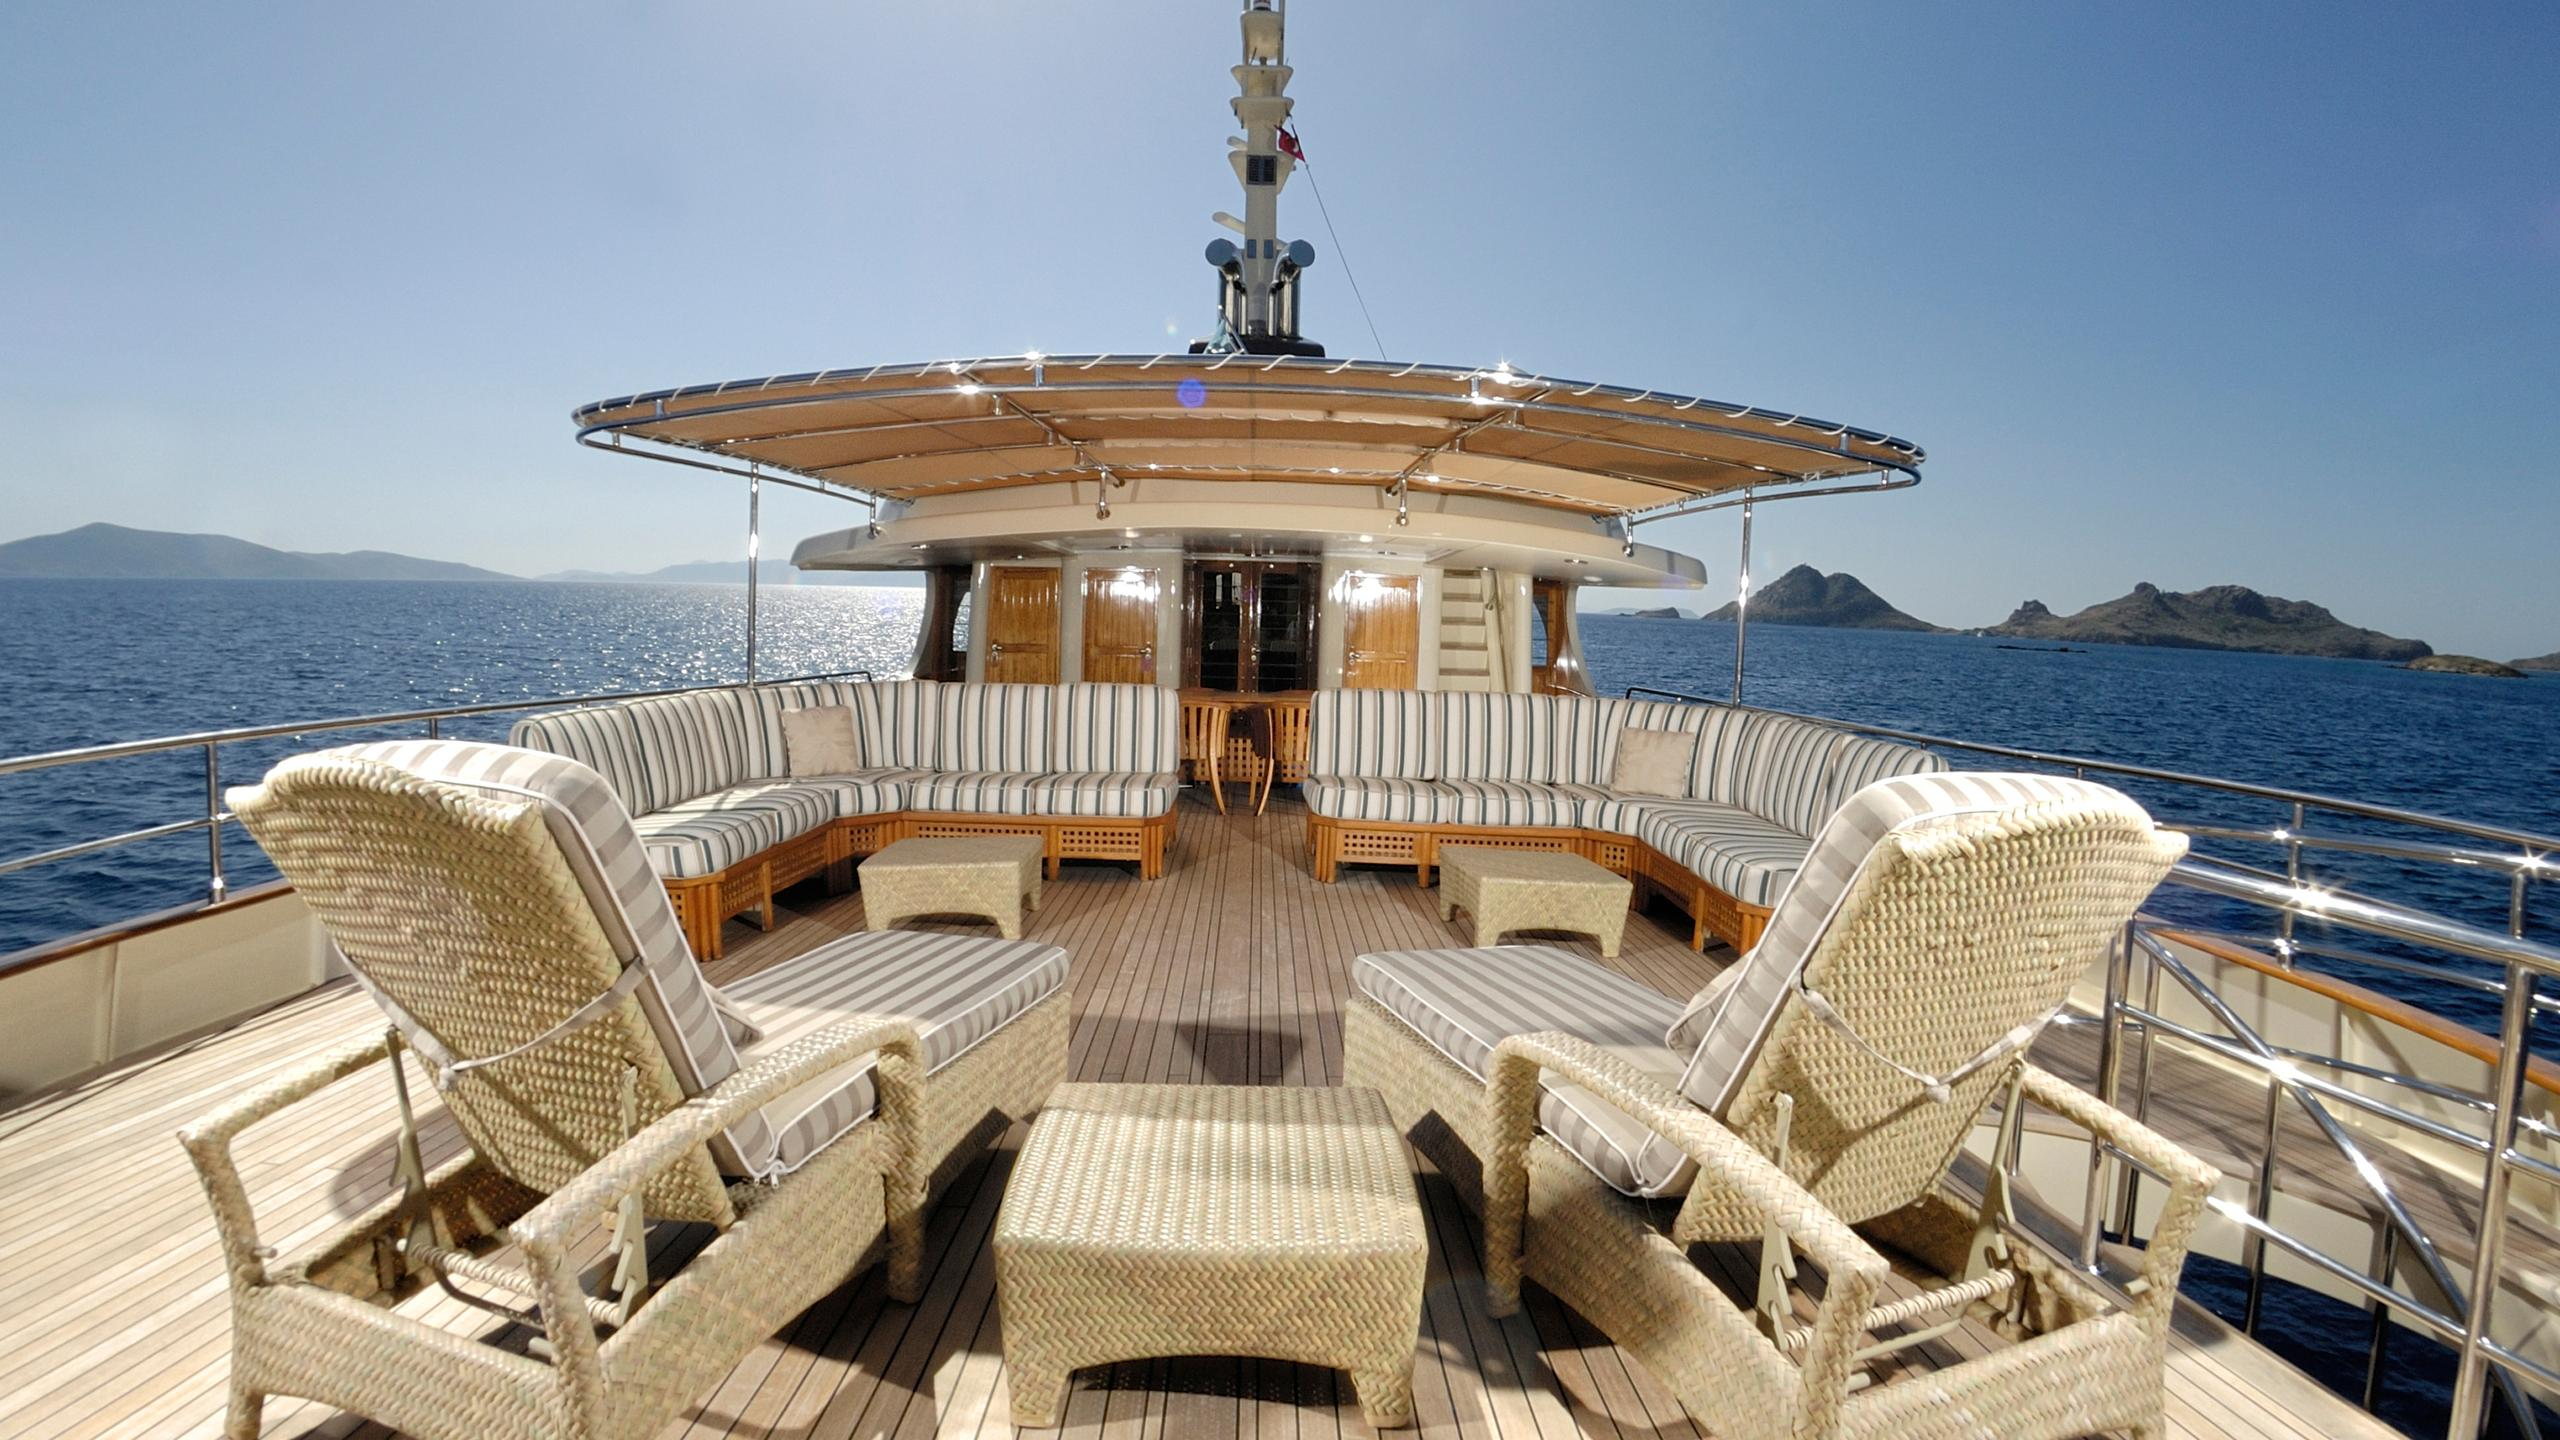 meserret-yacht-sun-lounger